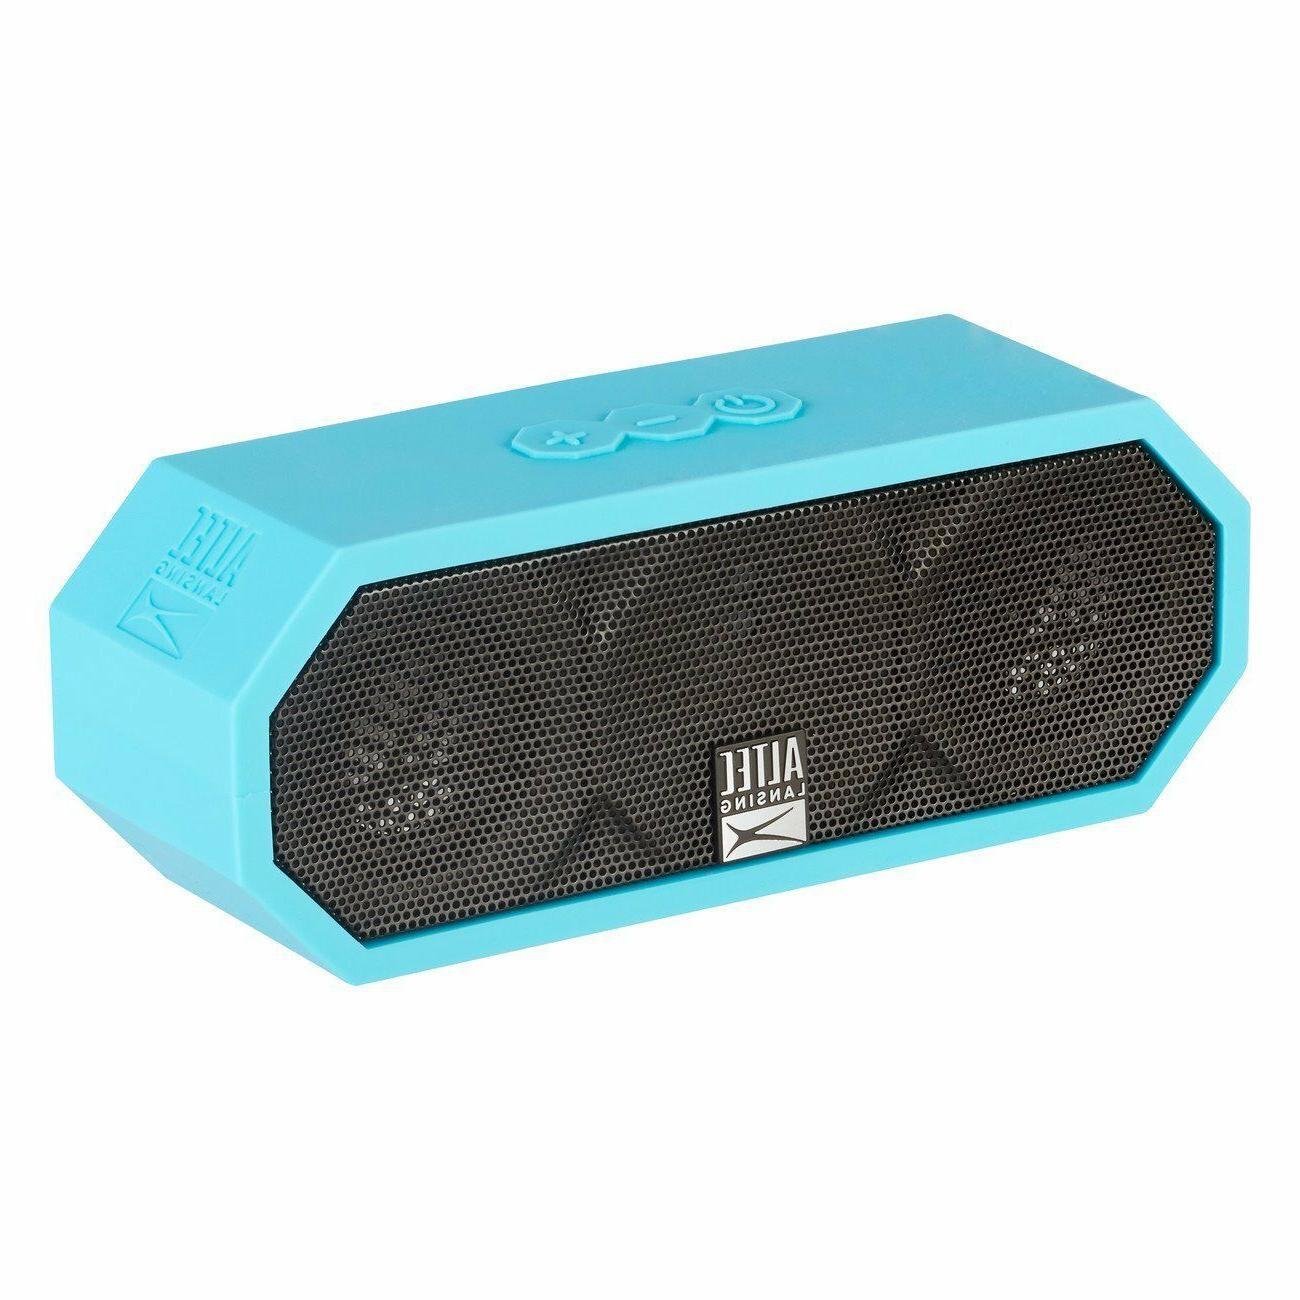 Altec Lansing The H20 Bluetooth Speaker iMW457